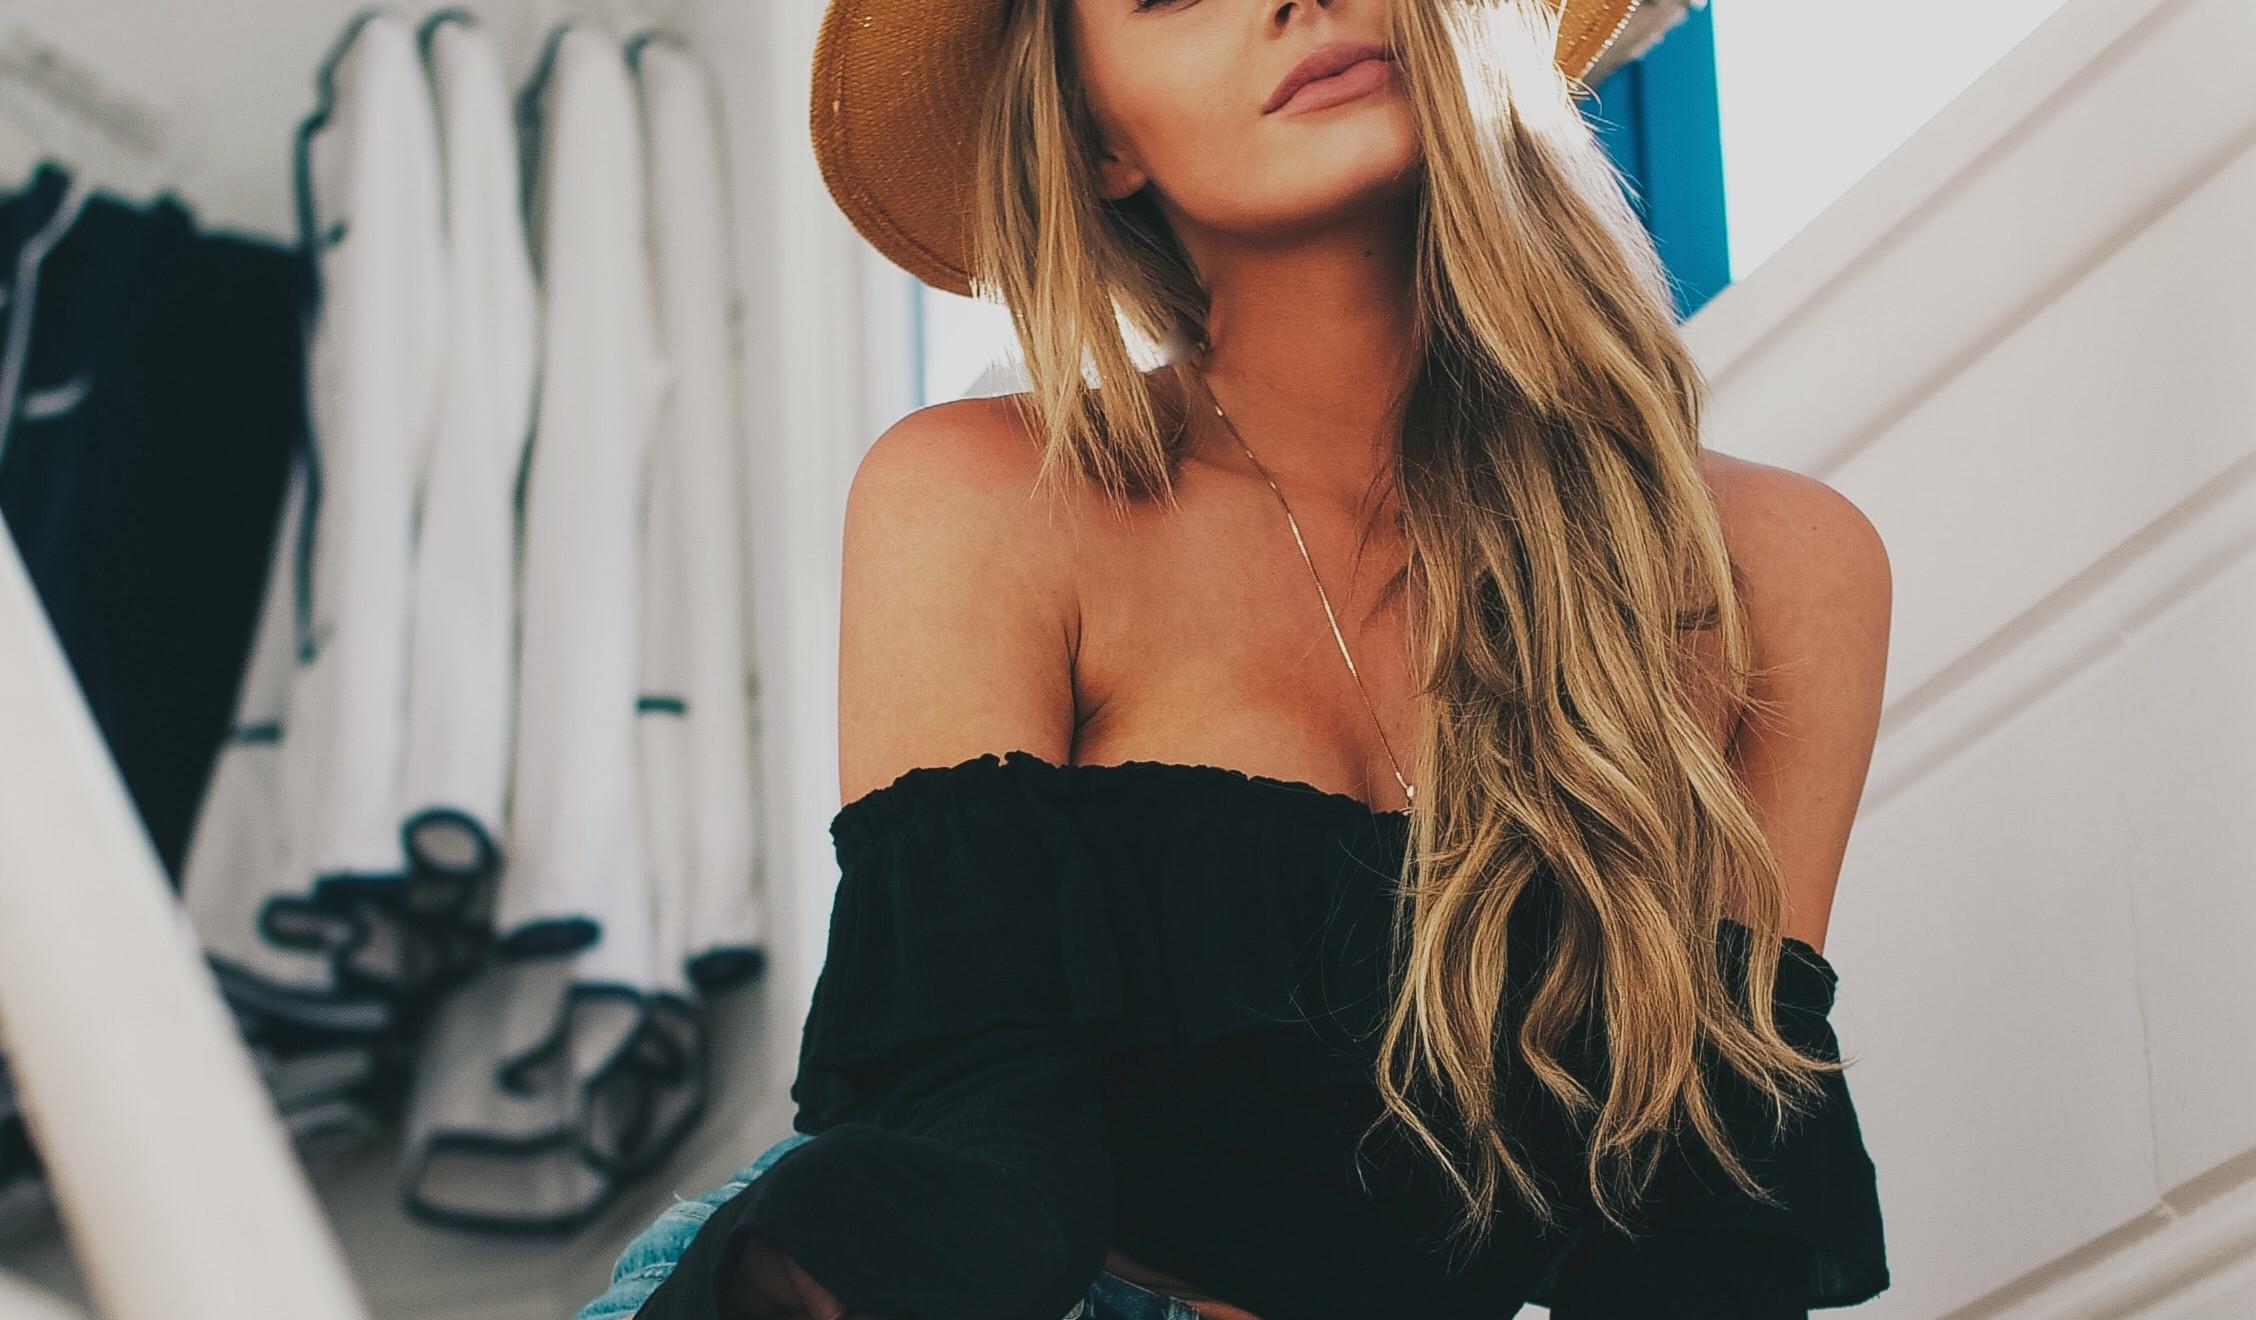 femme blond californien